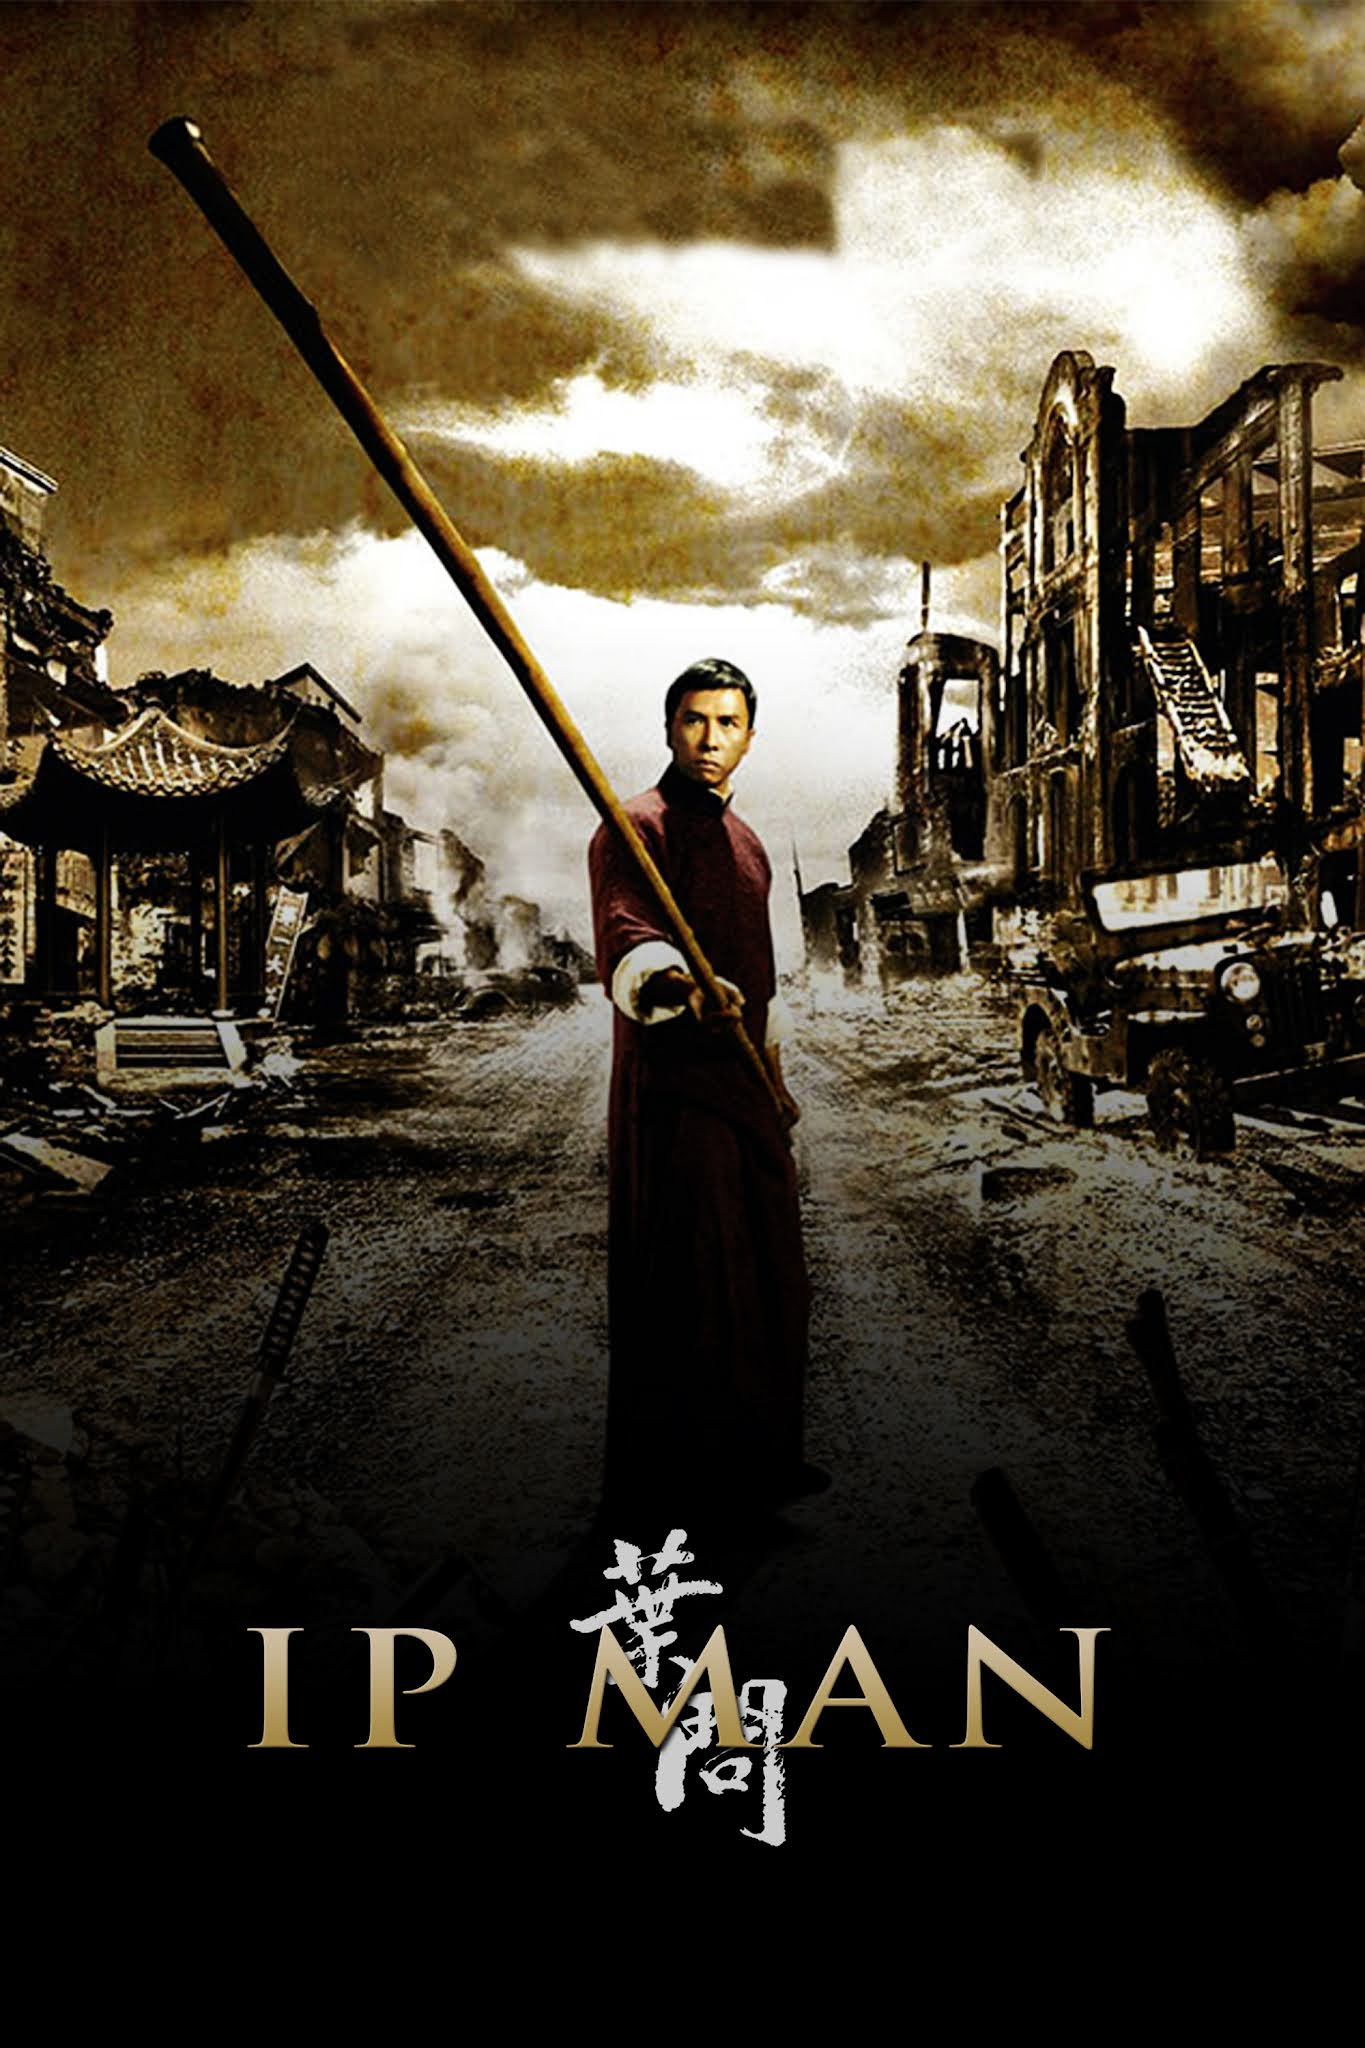 Download Ip Man 1 (2008) Full Movie in Hindi Dual Audio BluRay 480p [400MB]